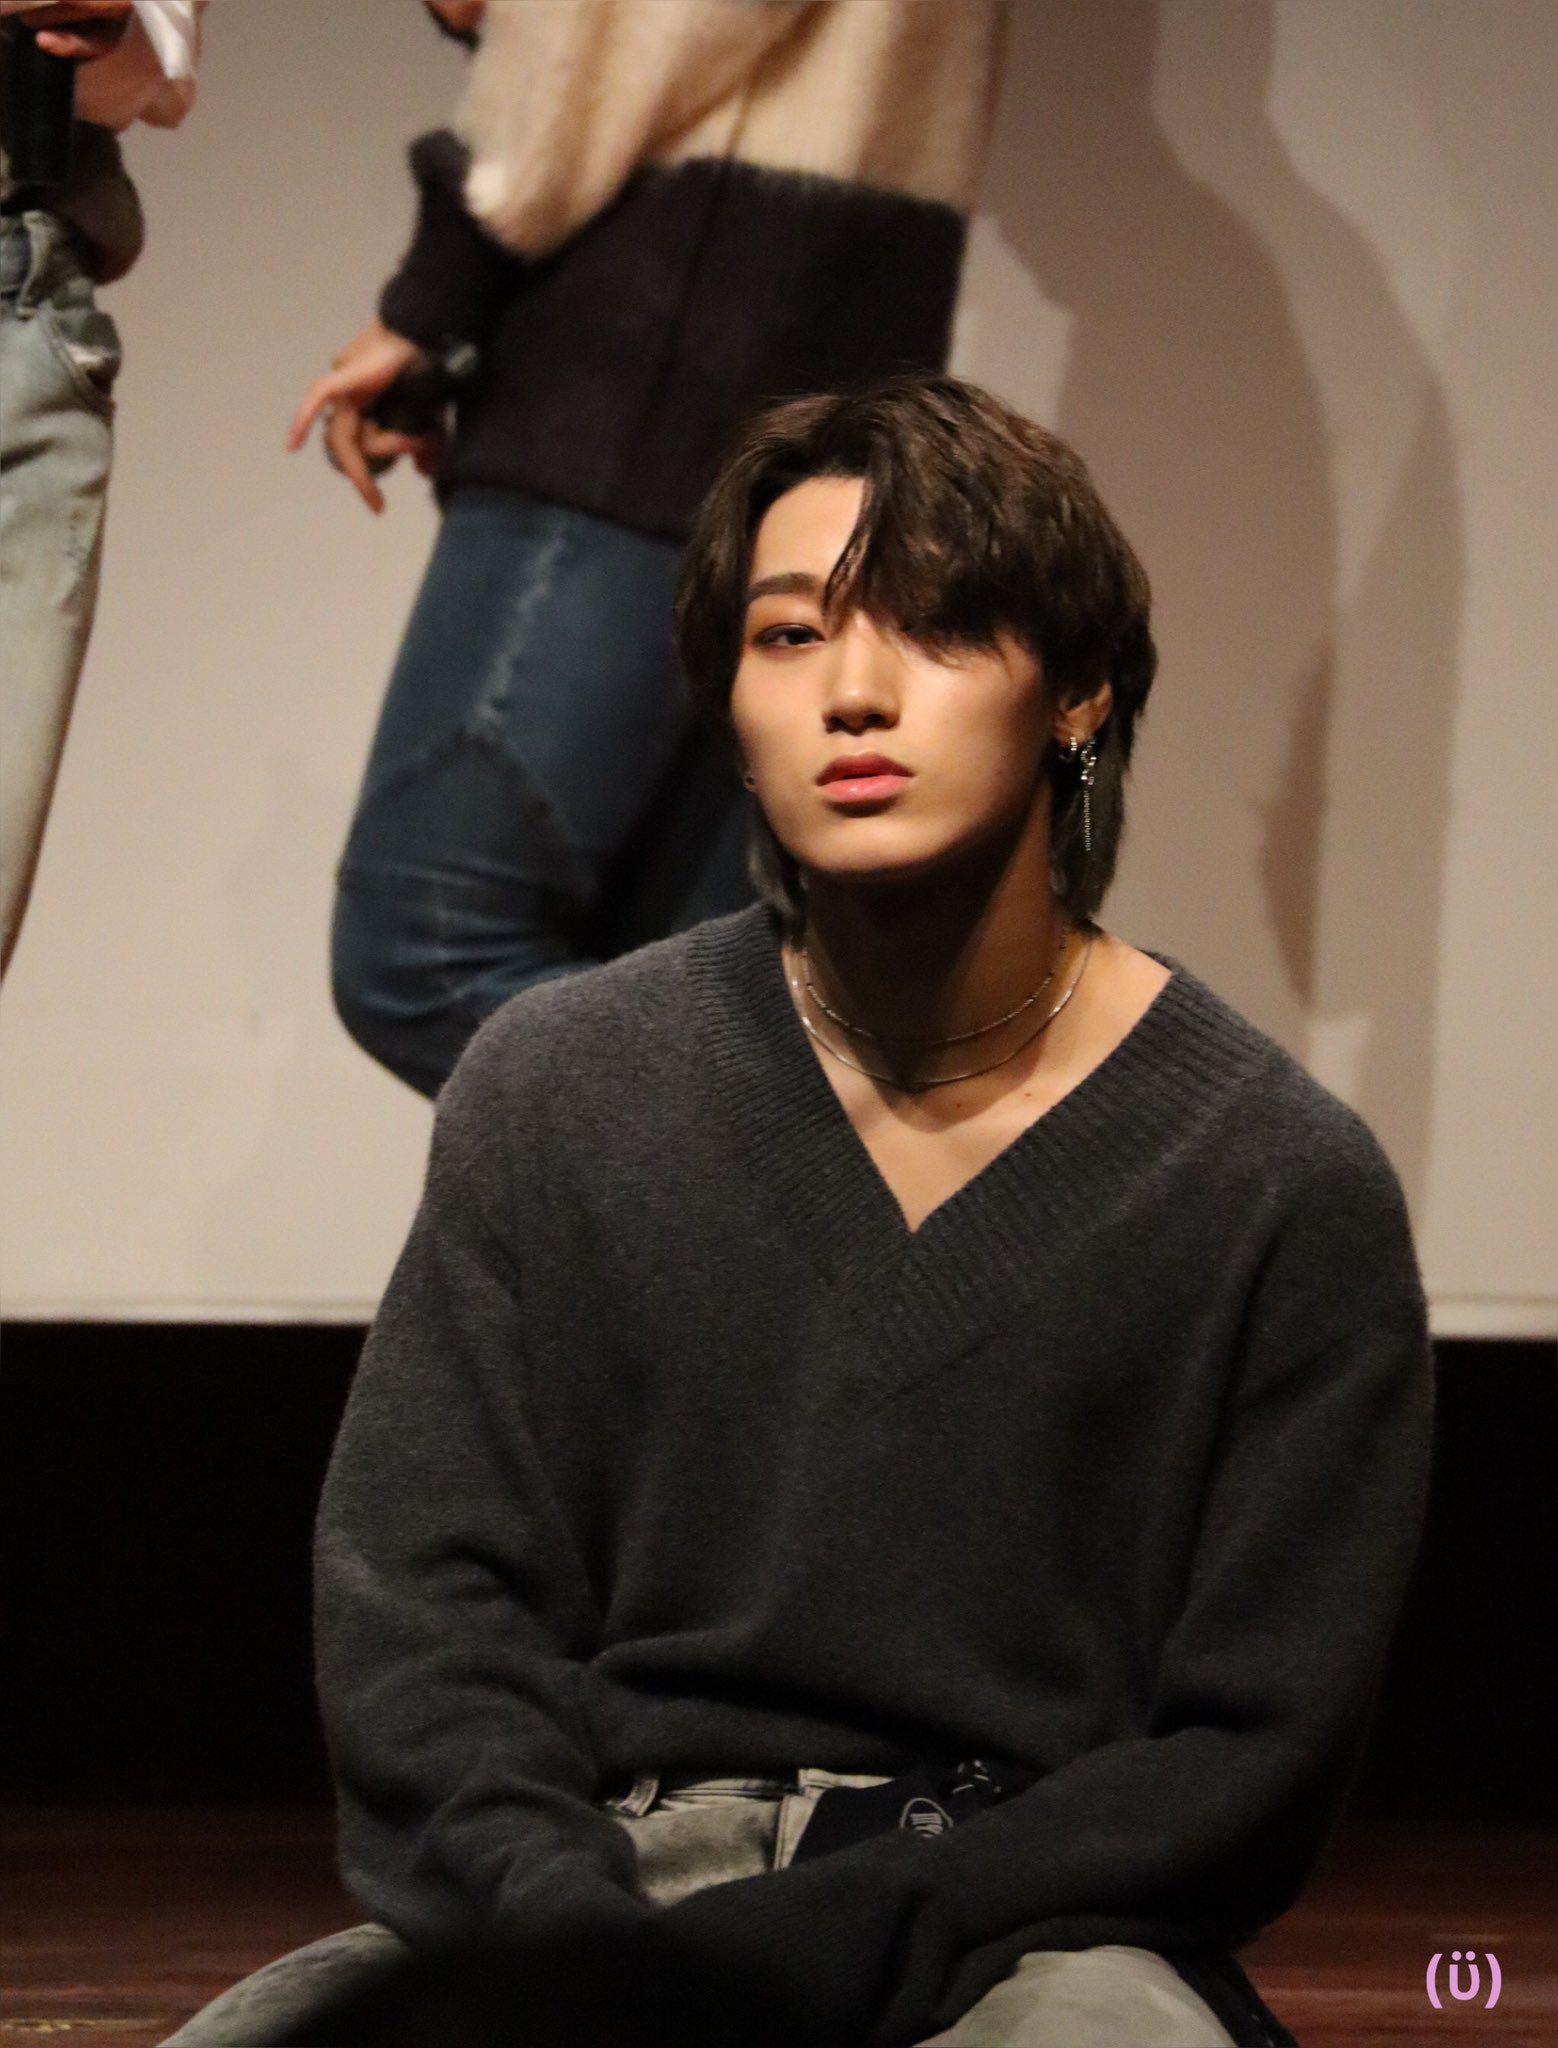 Pin By April On S A N San Fandom Kpop Boyfriend Material